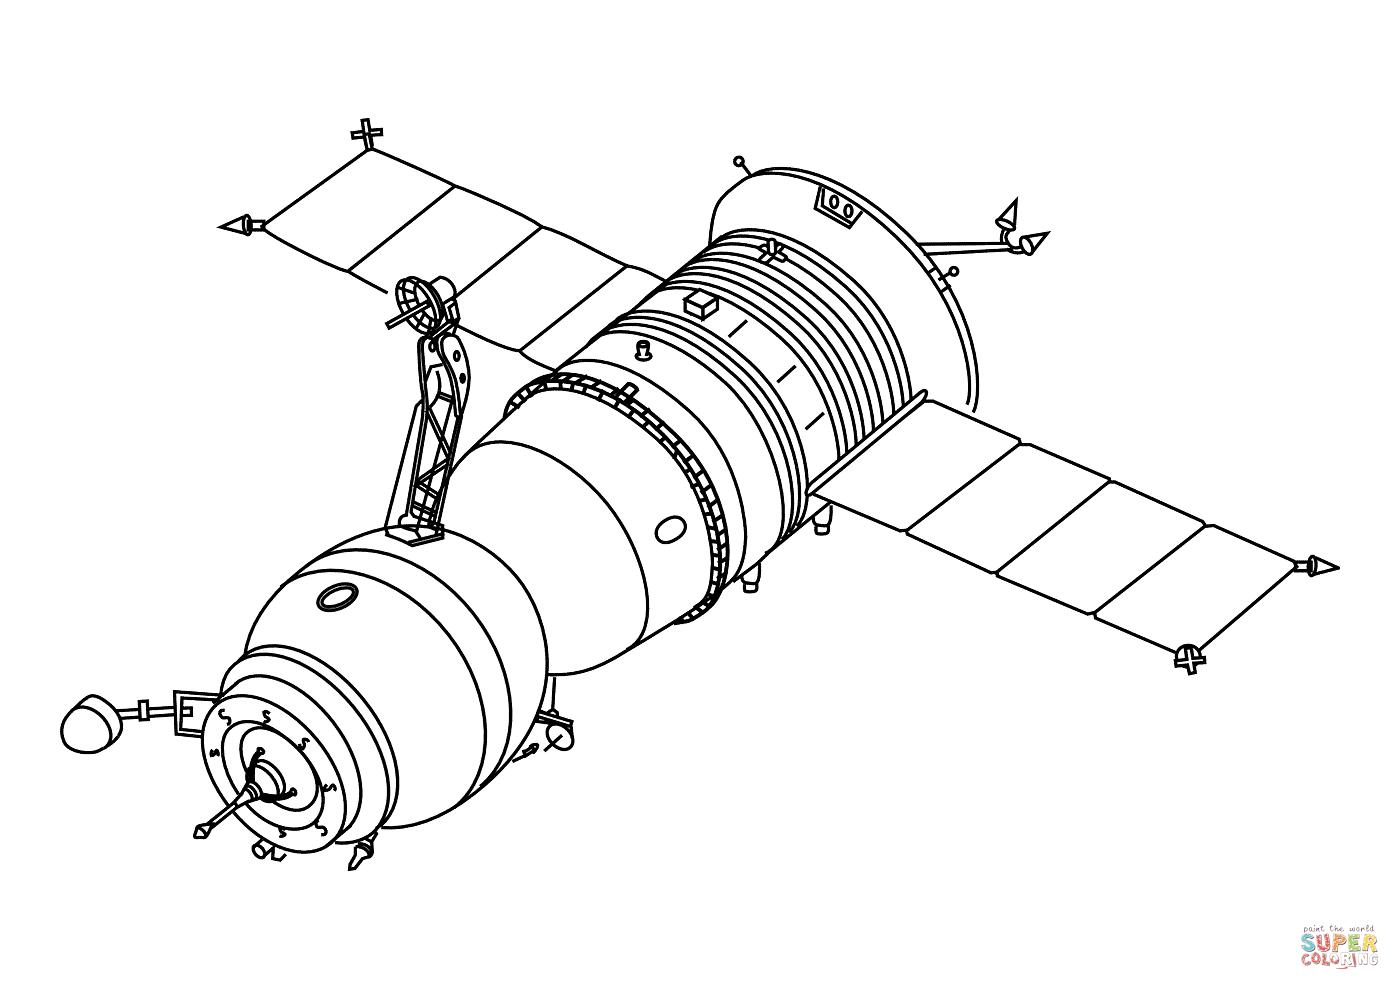 1400x990 Progress Cargo Spacecraft Coloring Page Free Printable Coloring